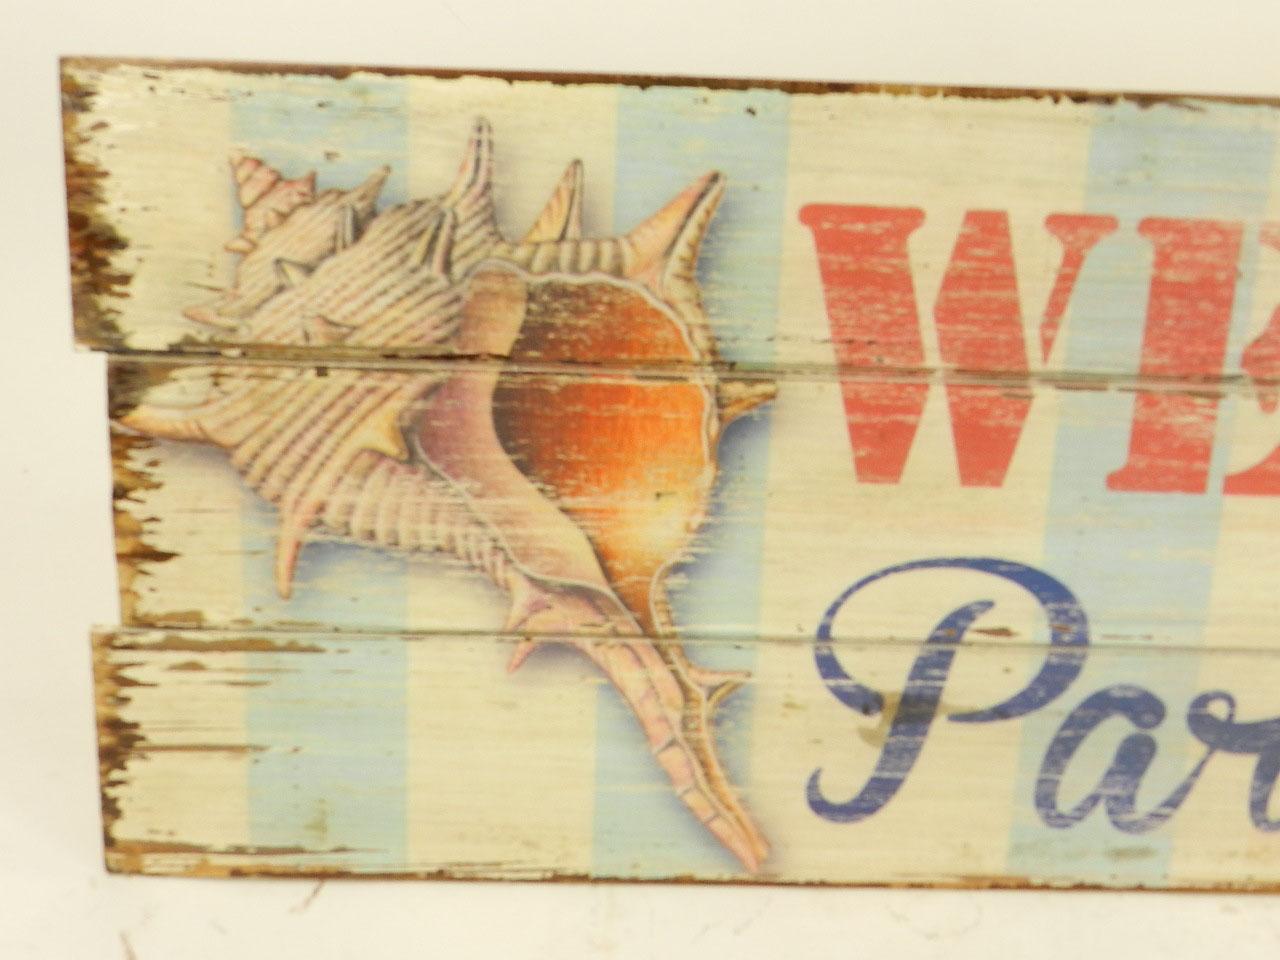 Imagen TABLA DECORATIVA WELCOME TO PARADISE 24313